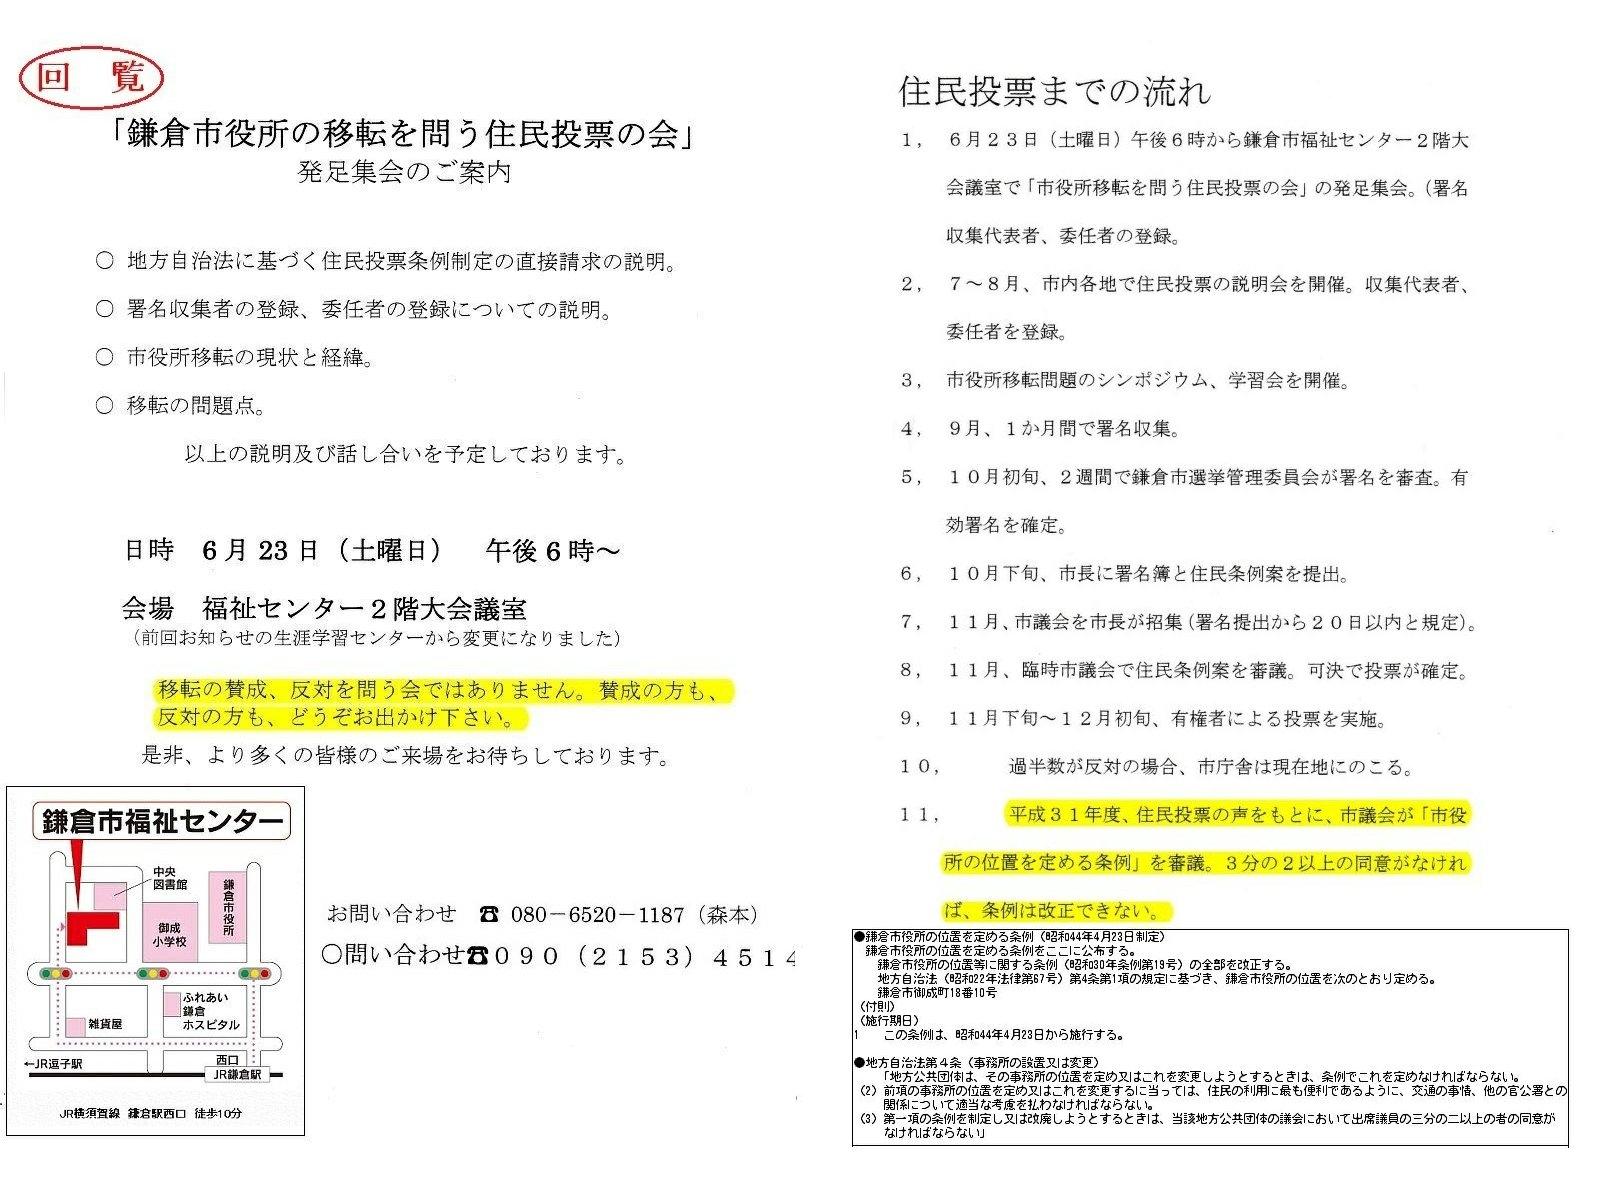 http://fujikama.coolblog.jp/2018/20180611K0.jpg